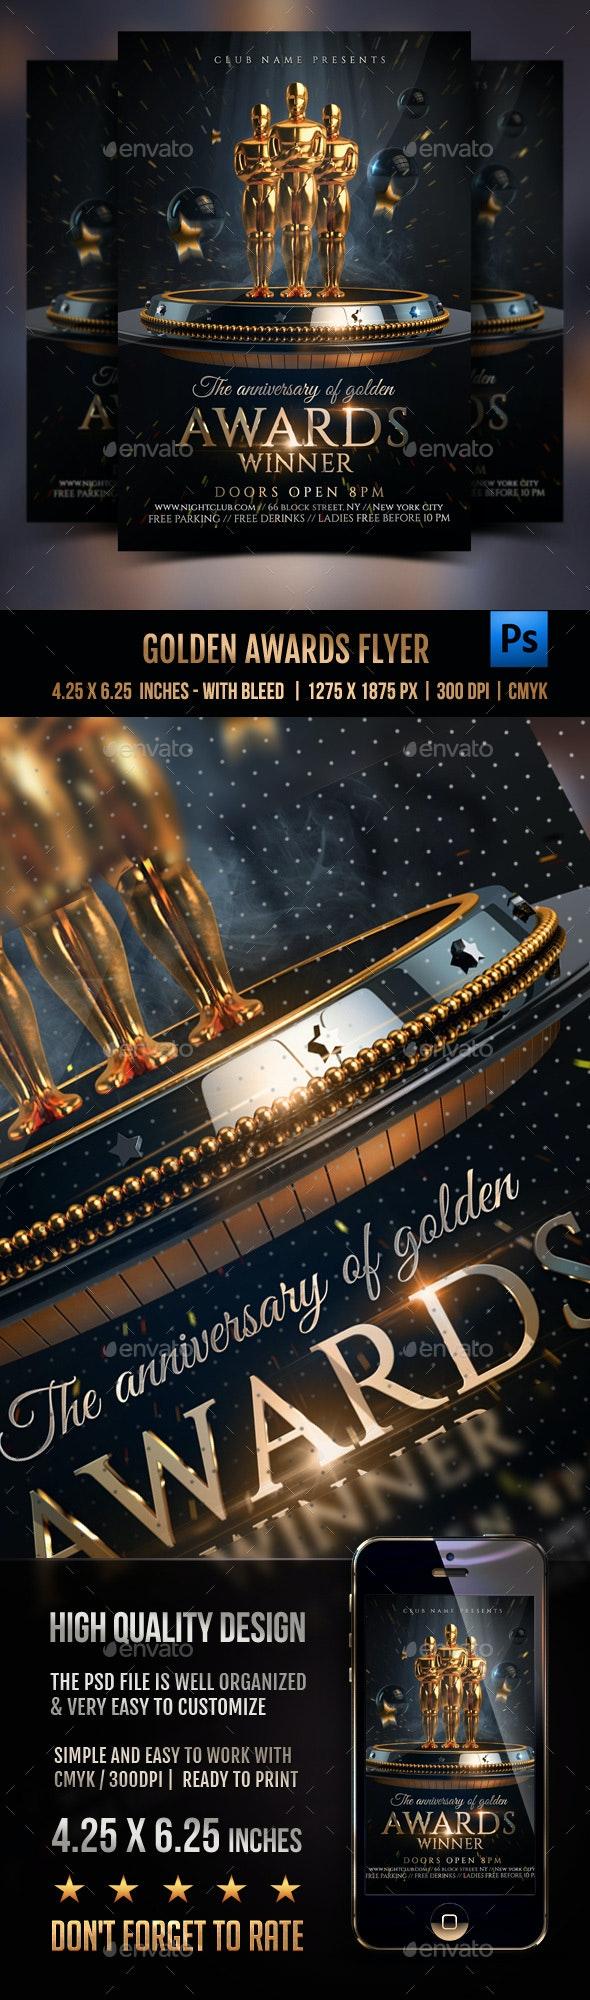 Golden Awards Flyer - Events Flyers